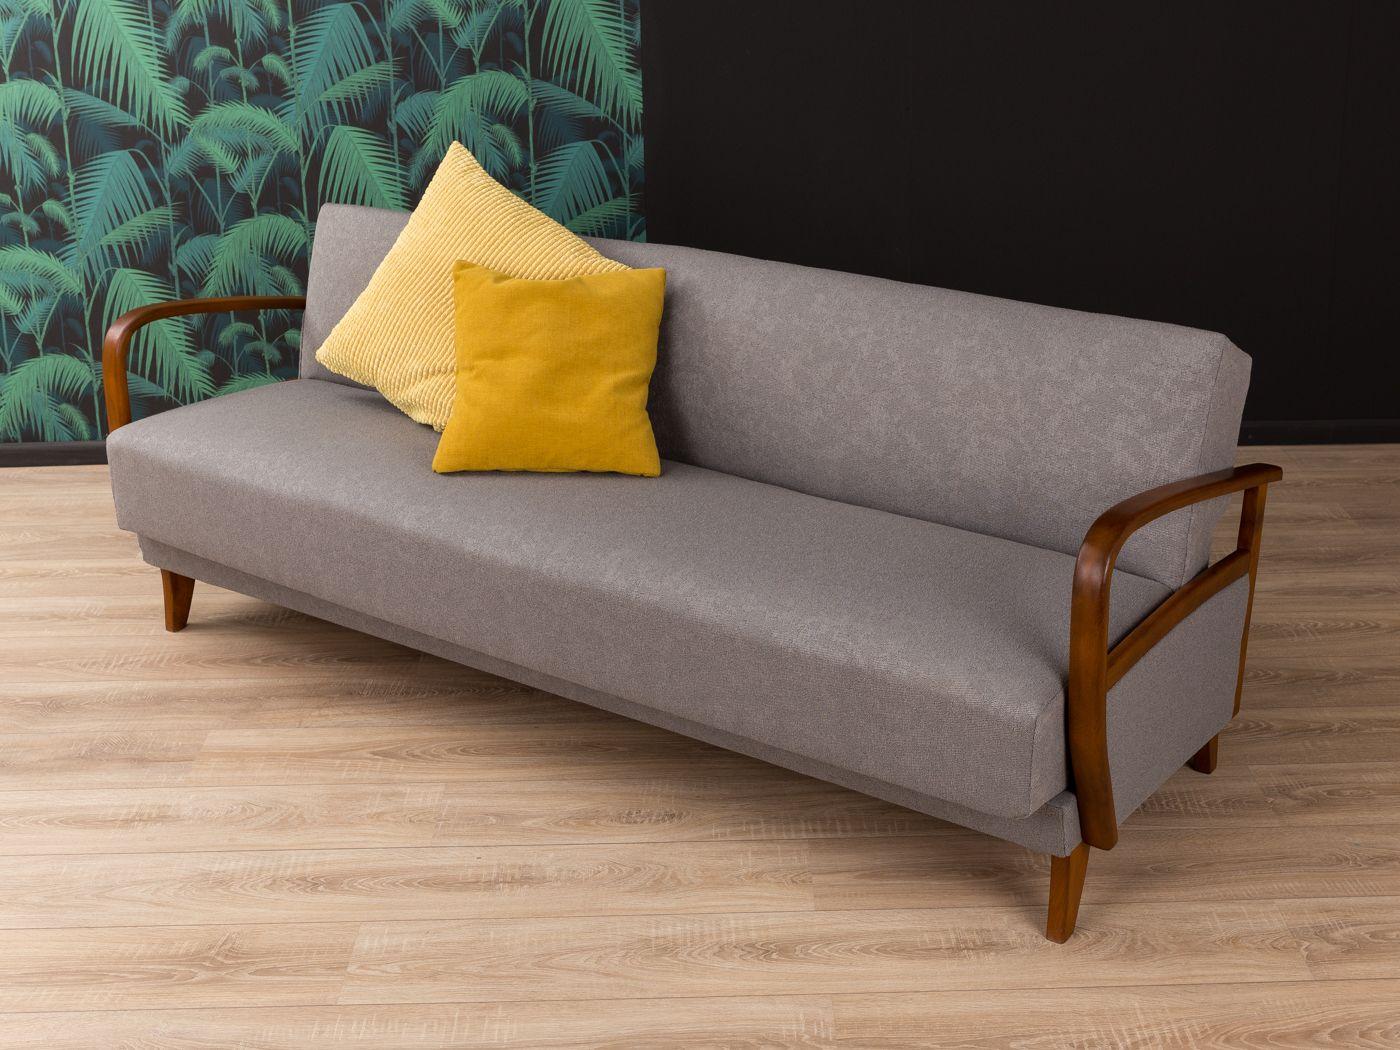 Graues Vintage Sofa oder Tagesbett, 1950er